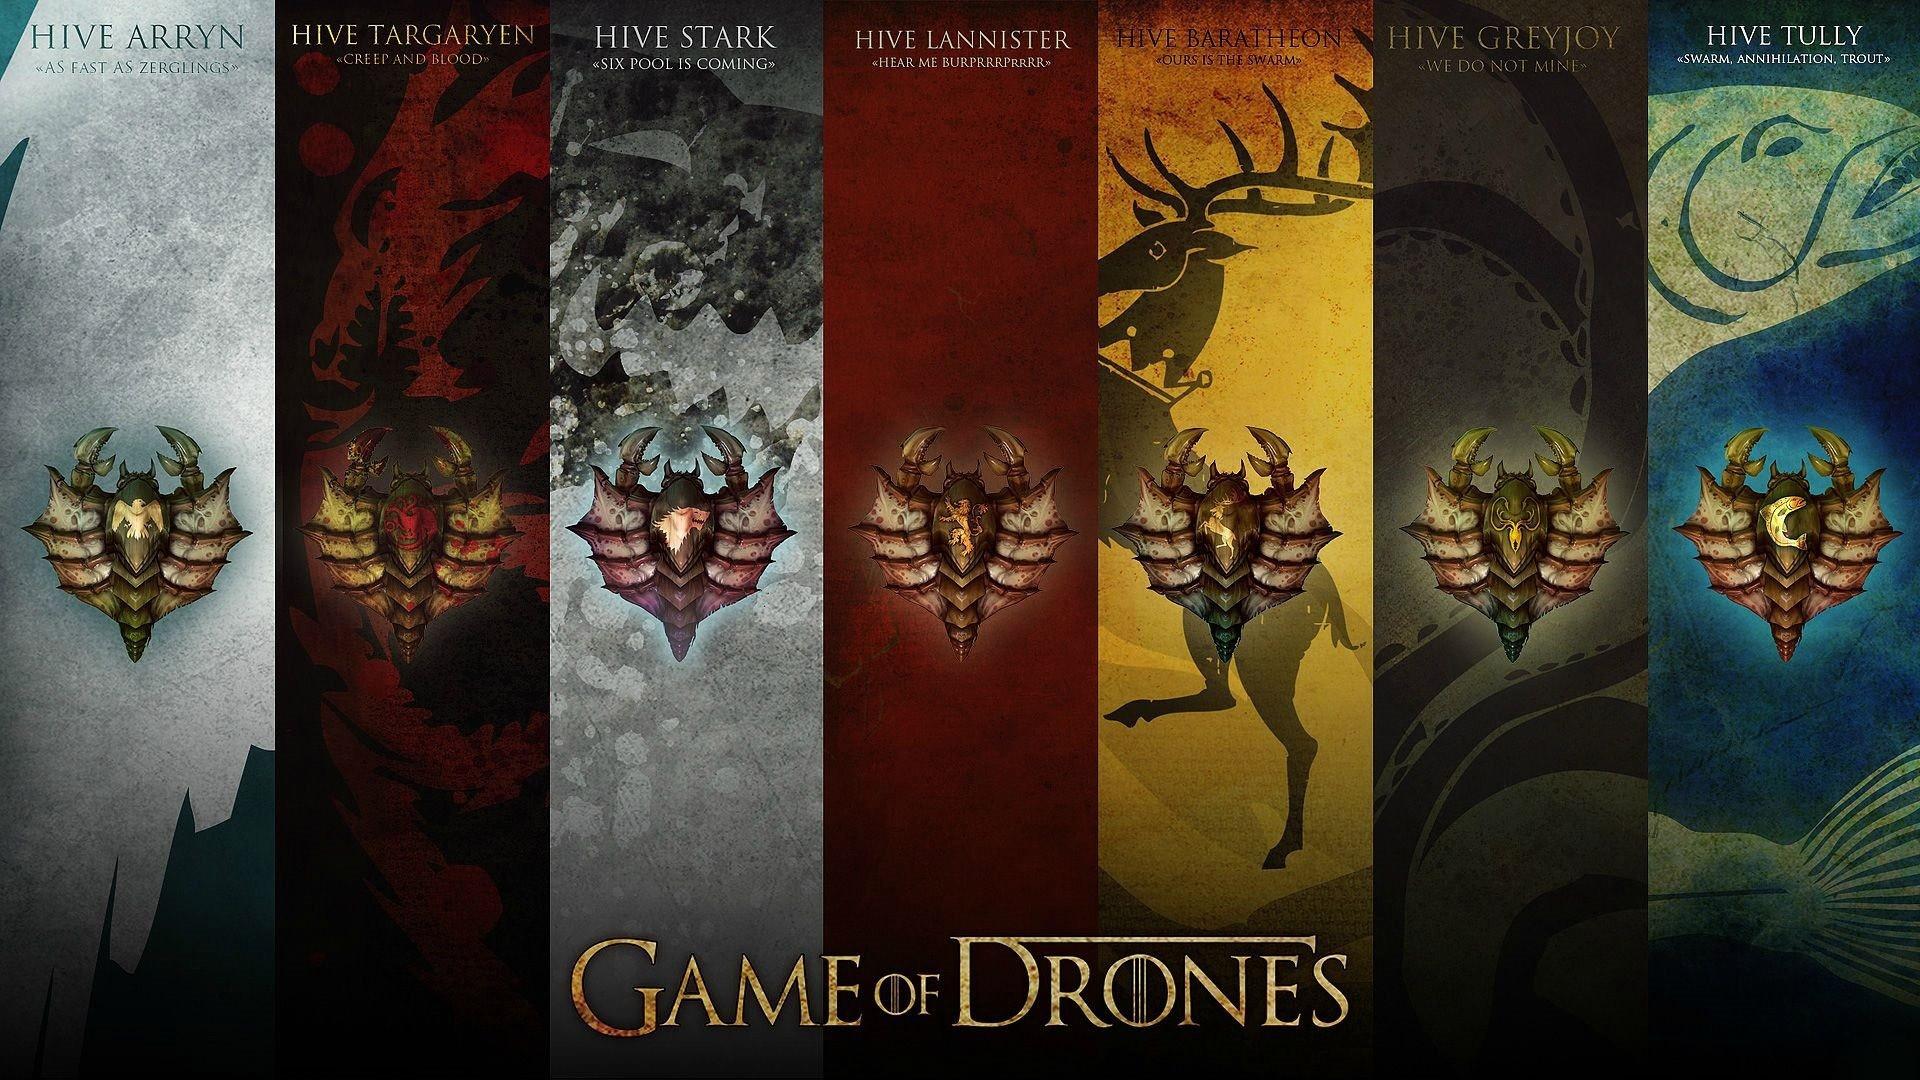 Game Of Drones Hd Wallpaper - Desktop Wallpaper Game Of Thrones - HD Wallpaper